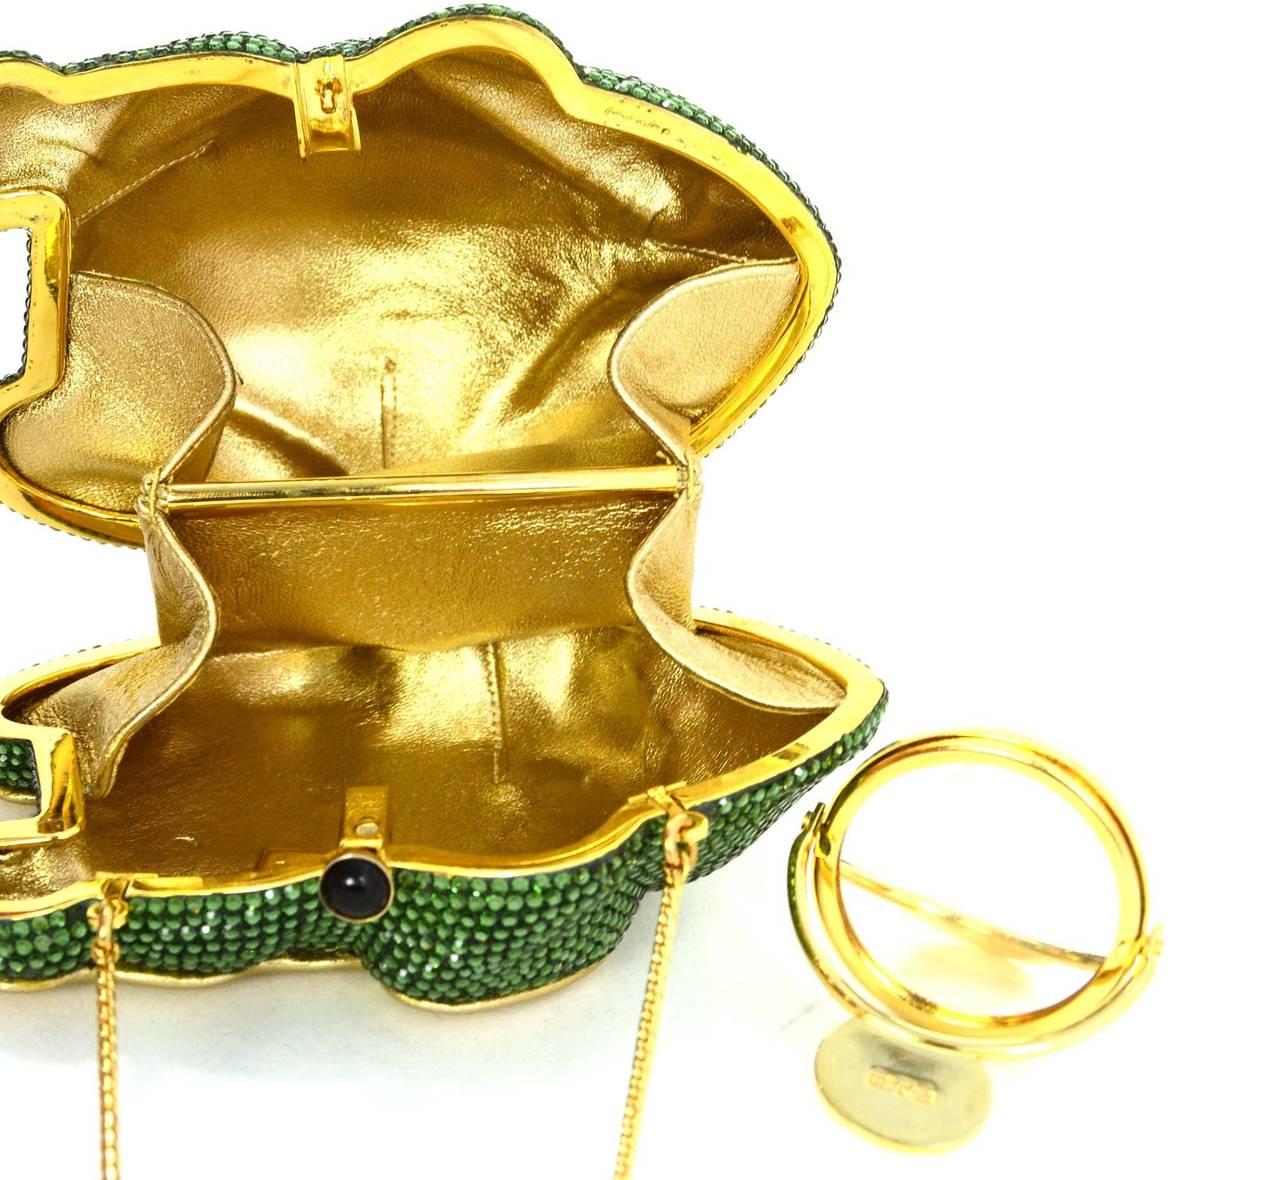 Judith Leiber Green Crystal Frog Minaudiere Bag GHW 5